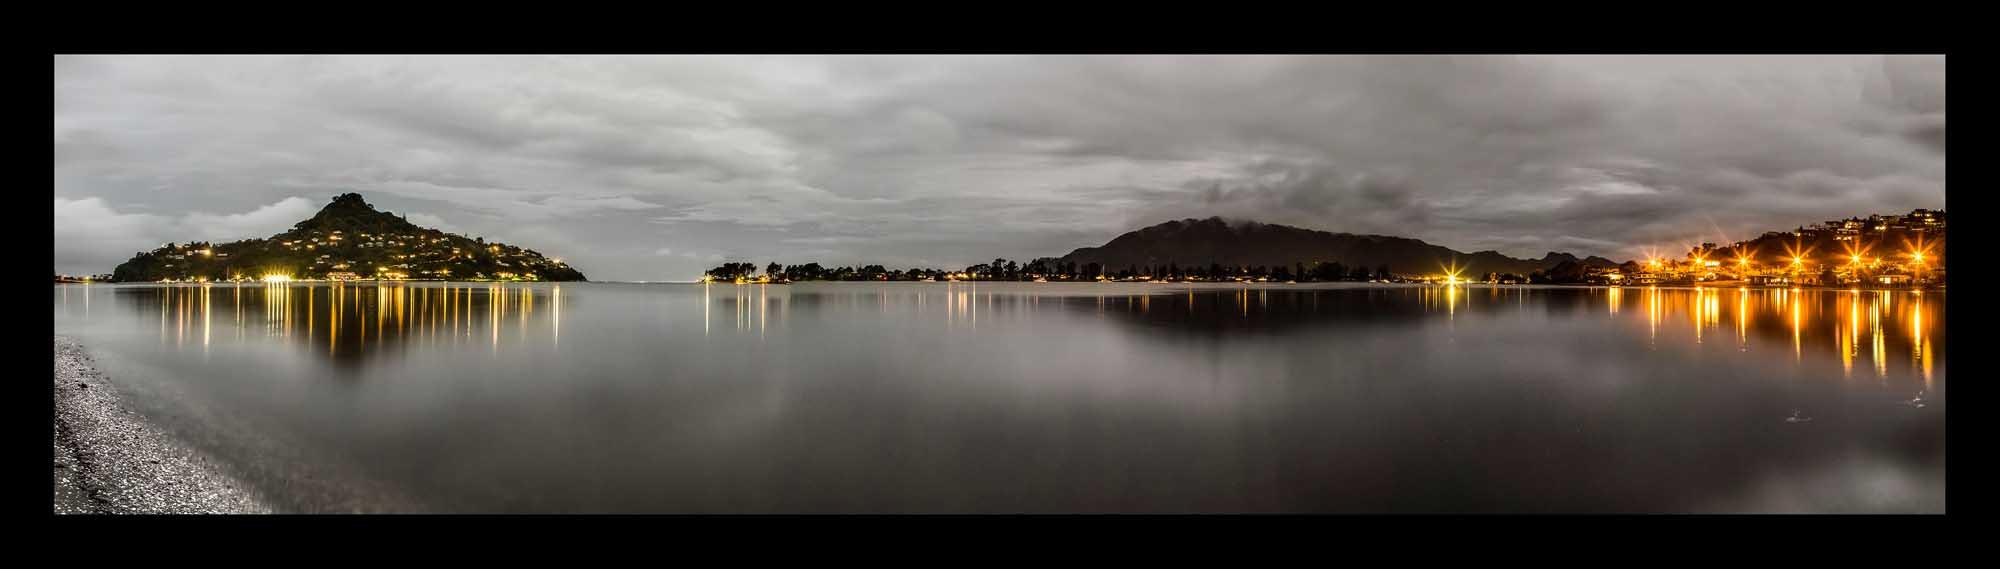 Tairua Harbour.jpg